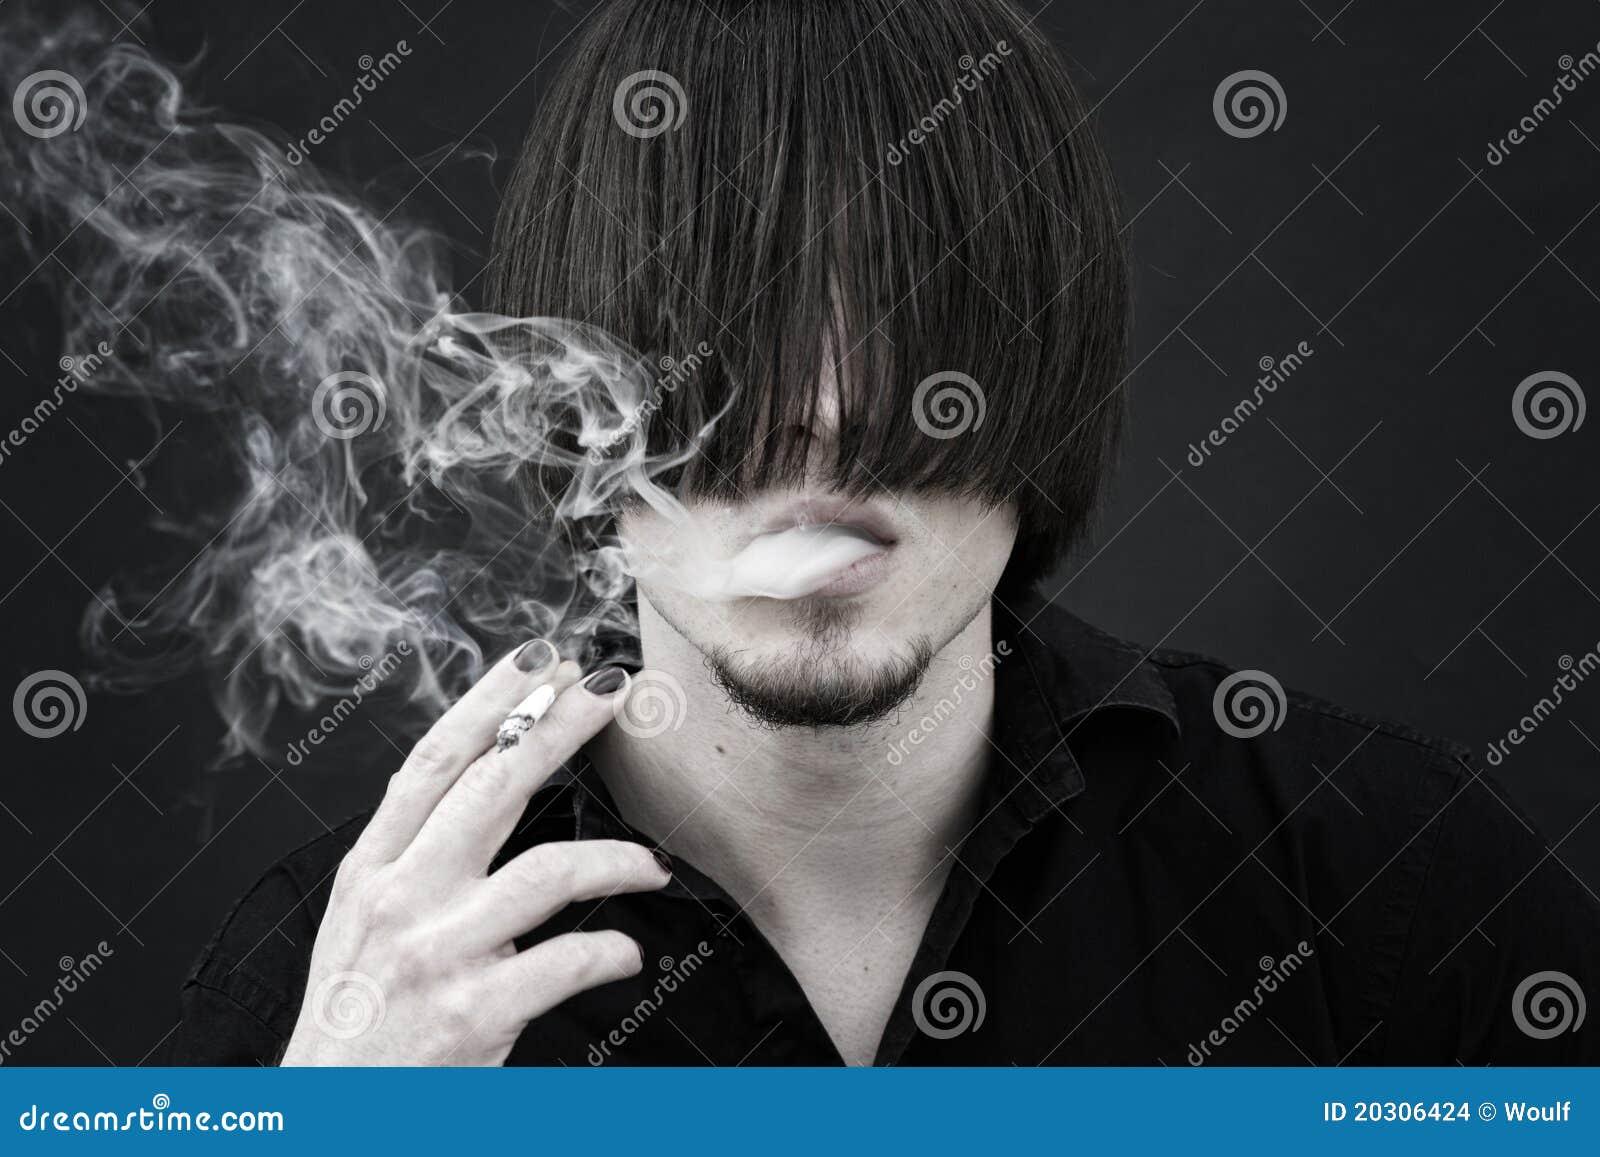 women smoke cigarettes sex